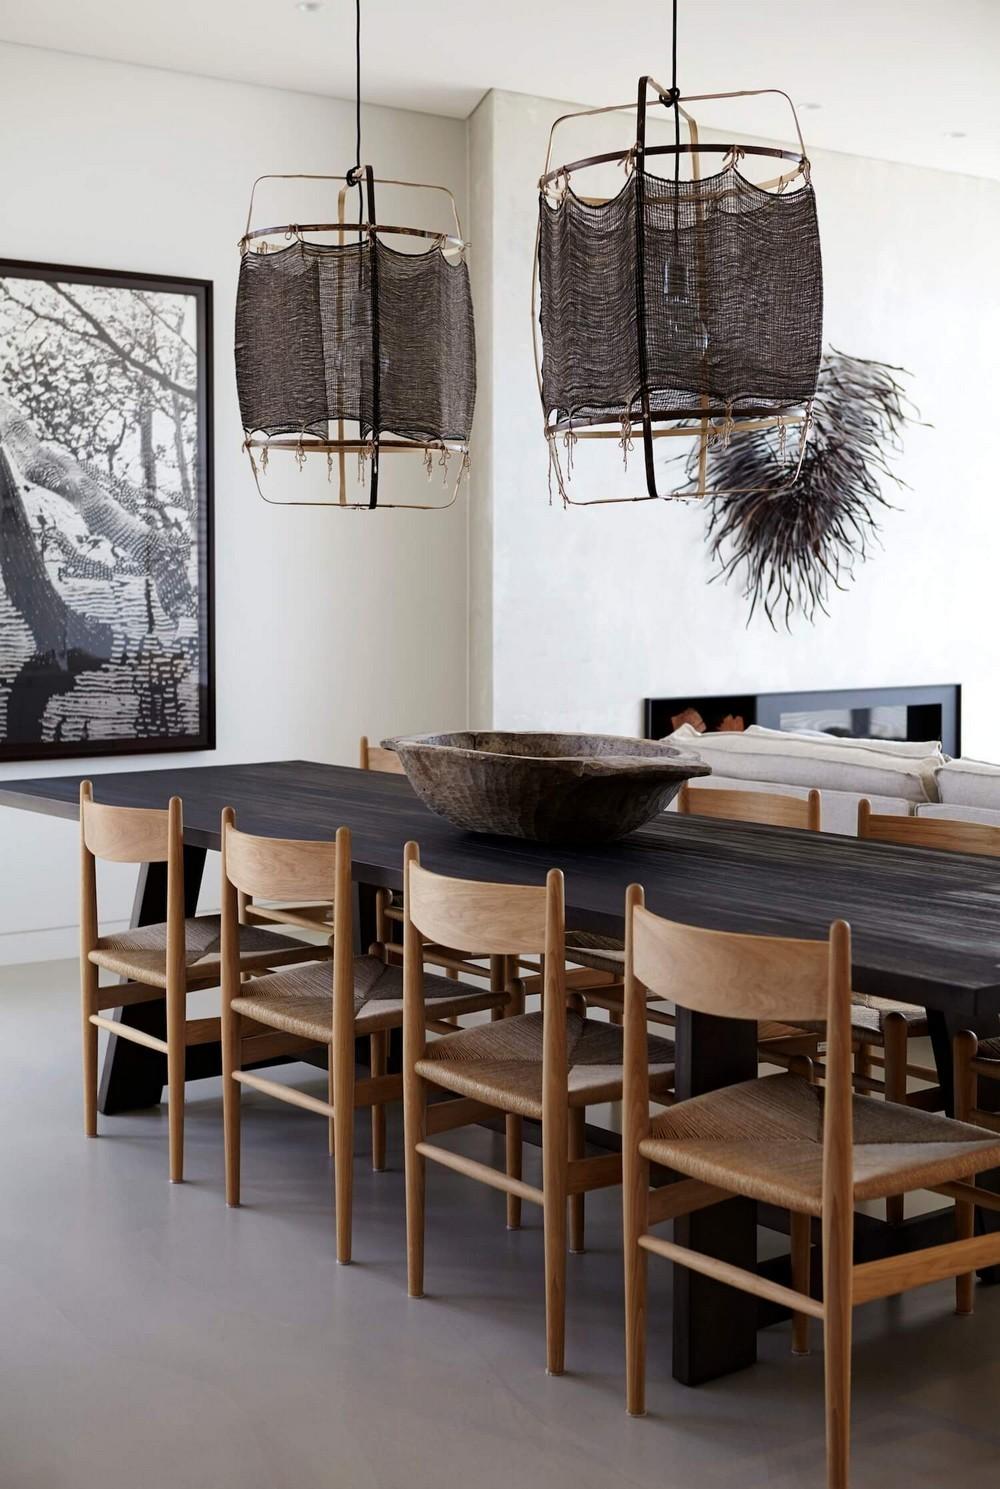 Top 20 Interior Designers From Sydney interior designers from sydney Top 20 Interior Designers From Sydney hare klein 1